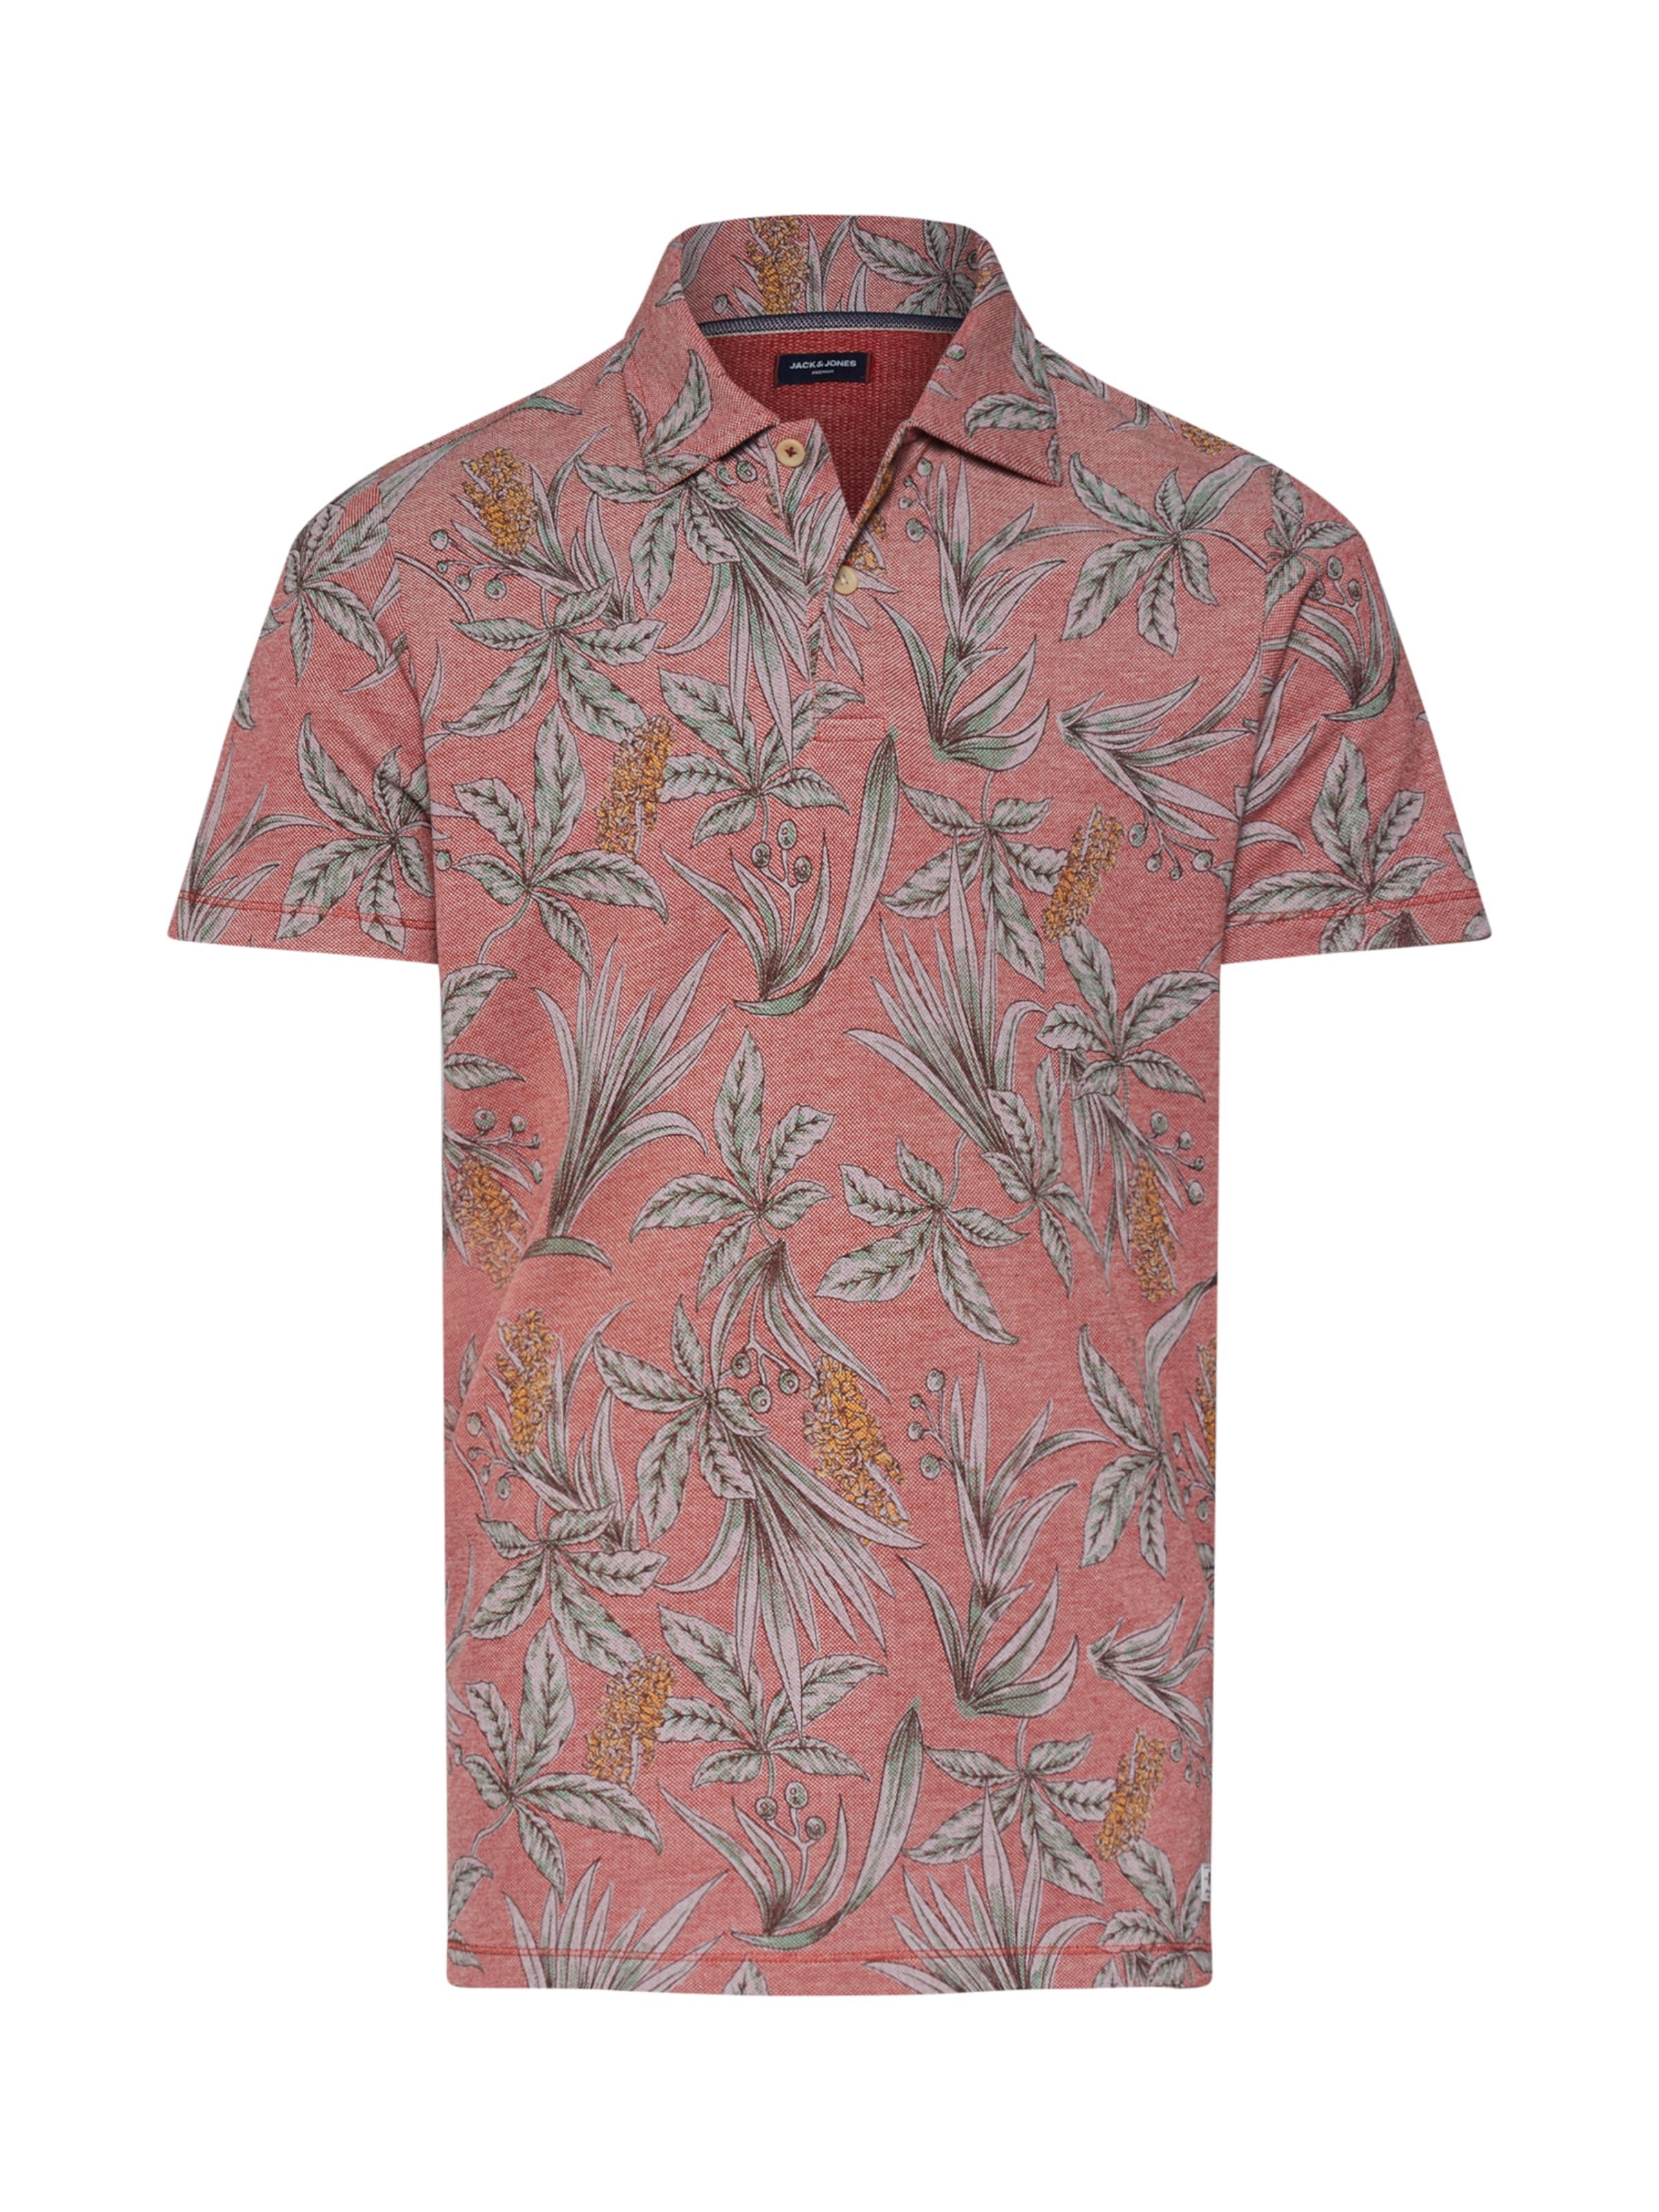 Jones Bleu En shirt T Foncé 'jprelliott' Jackamp; nw0O8kP